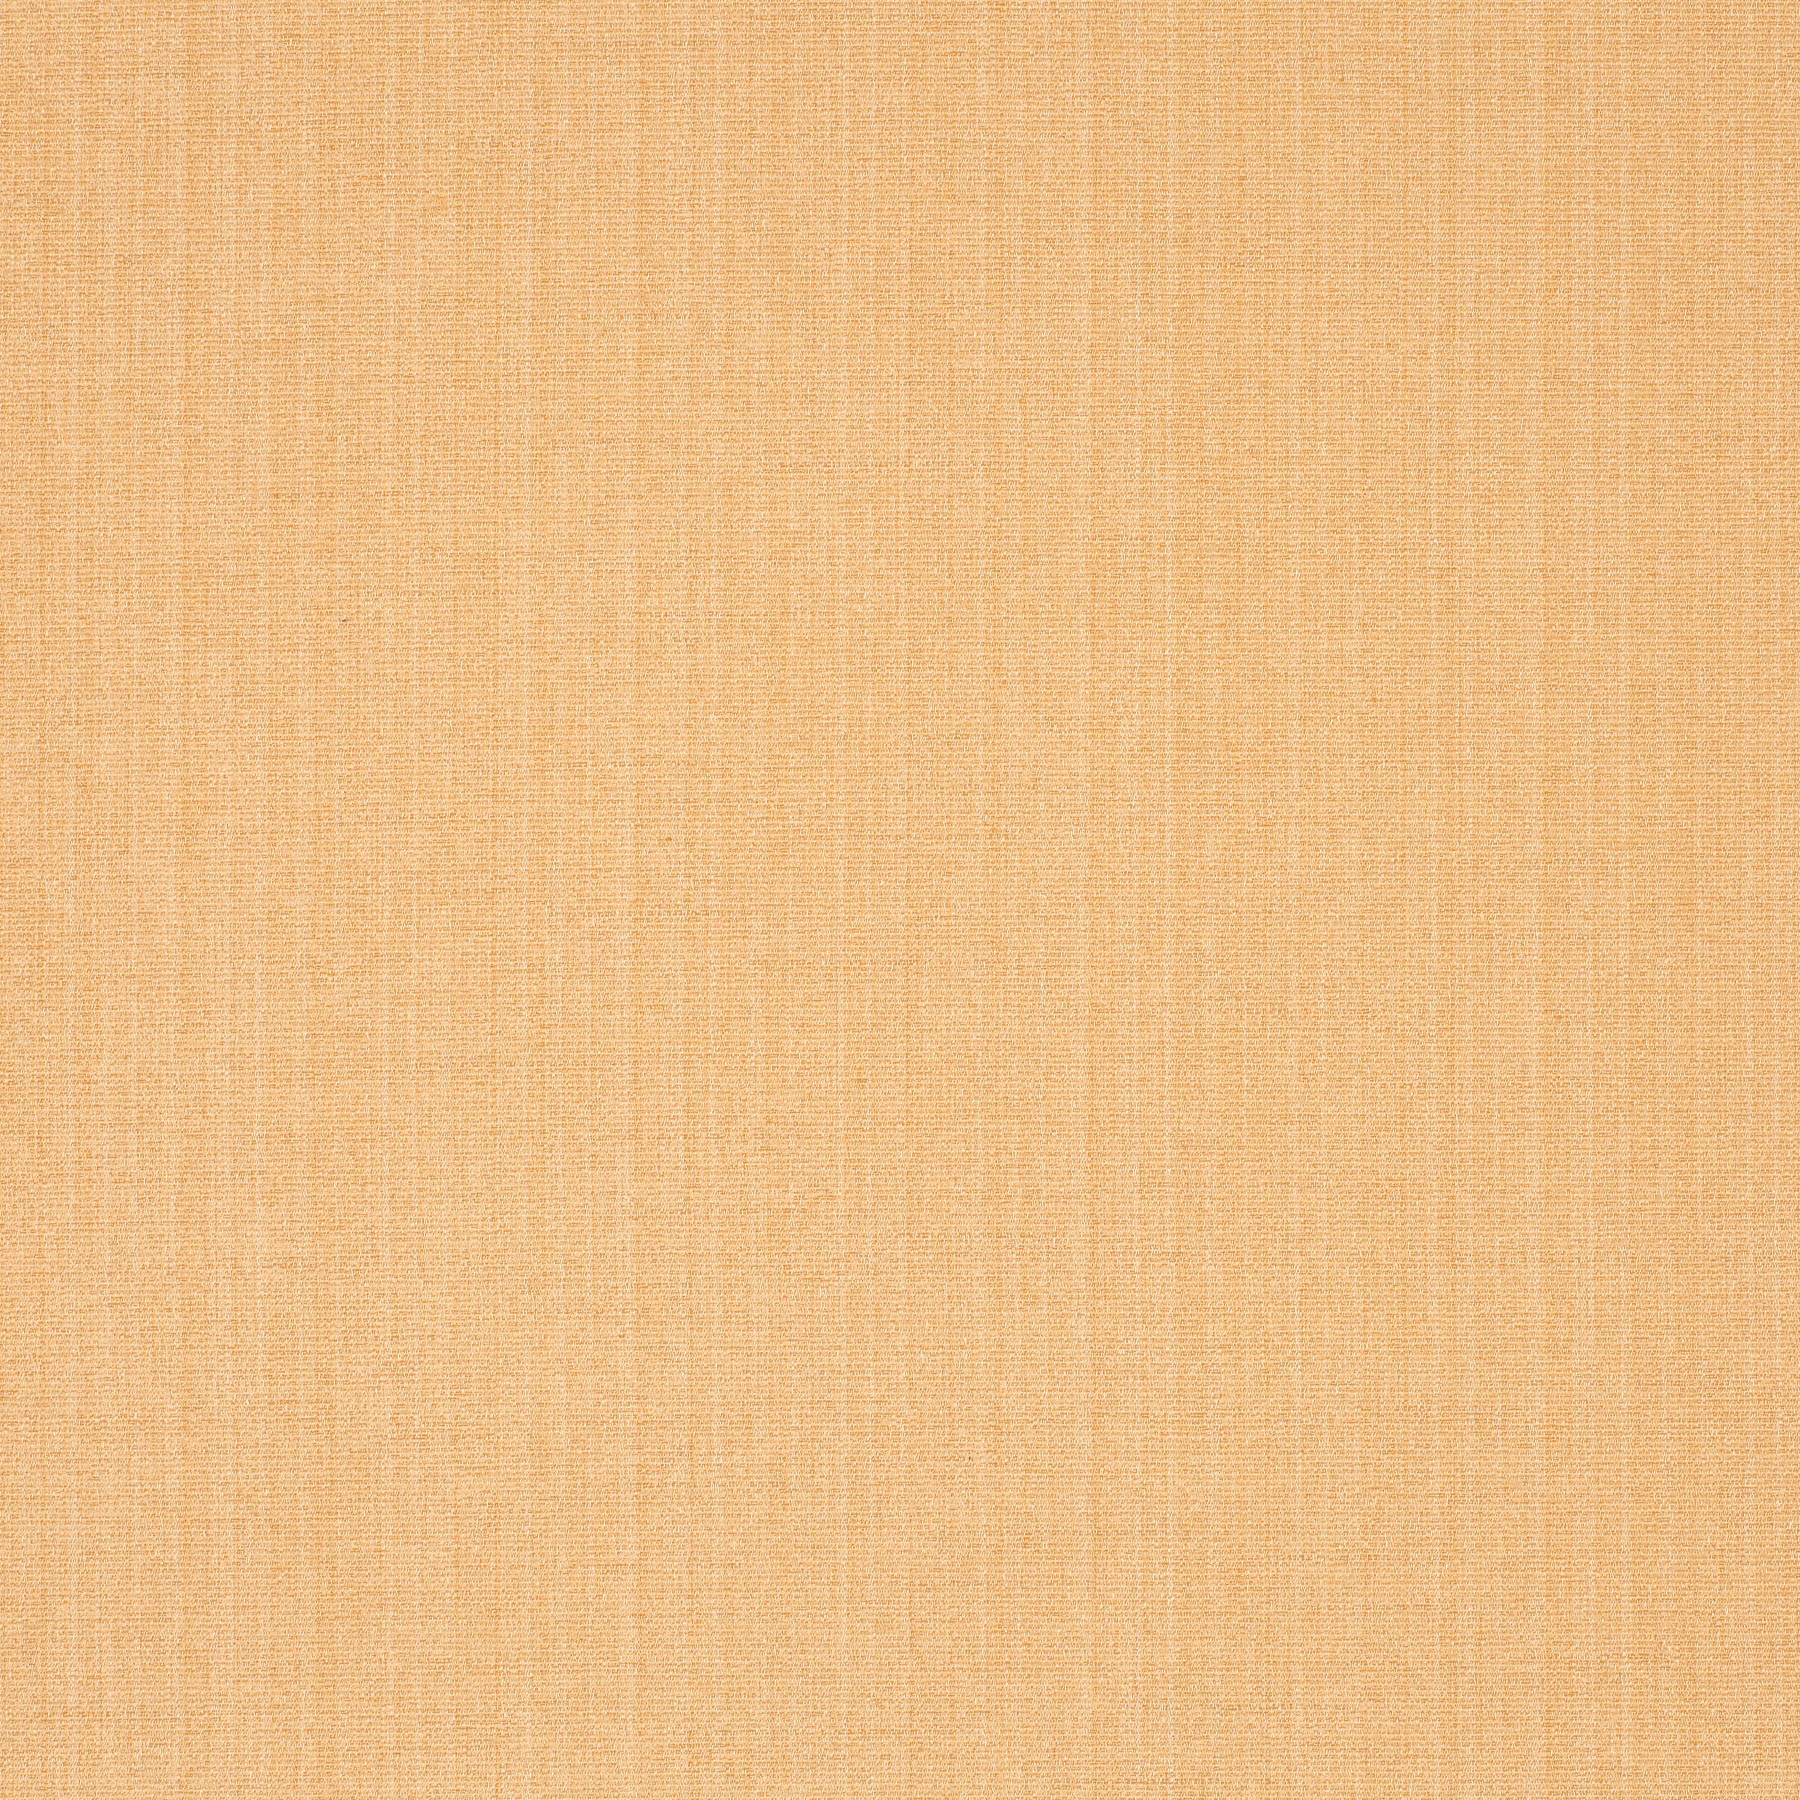 Decoration Fabric Gregory Vol 2 1 6485 146 Jab Anstoetz